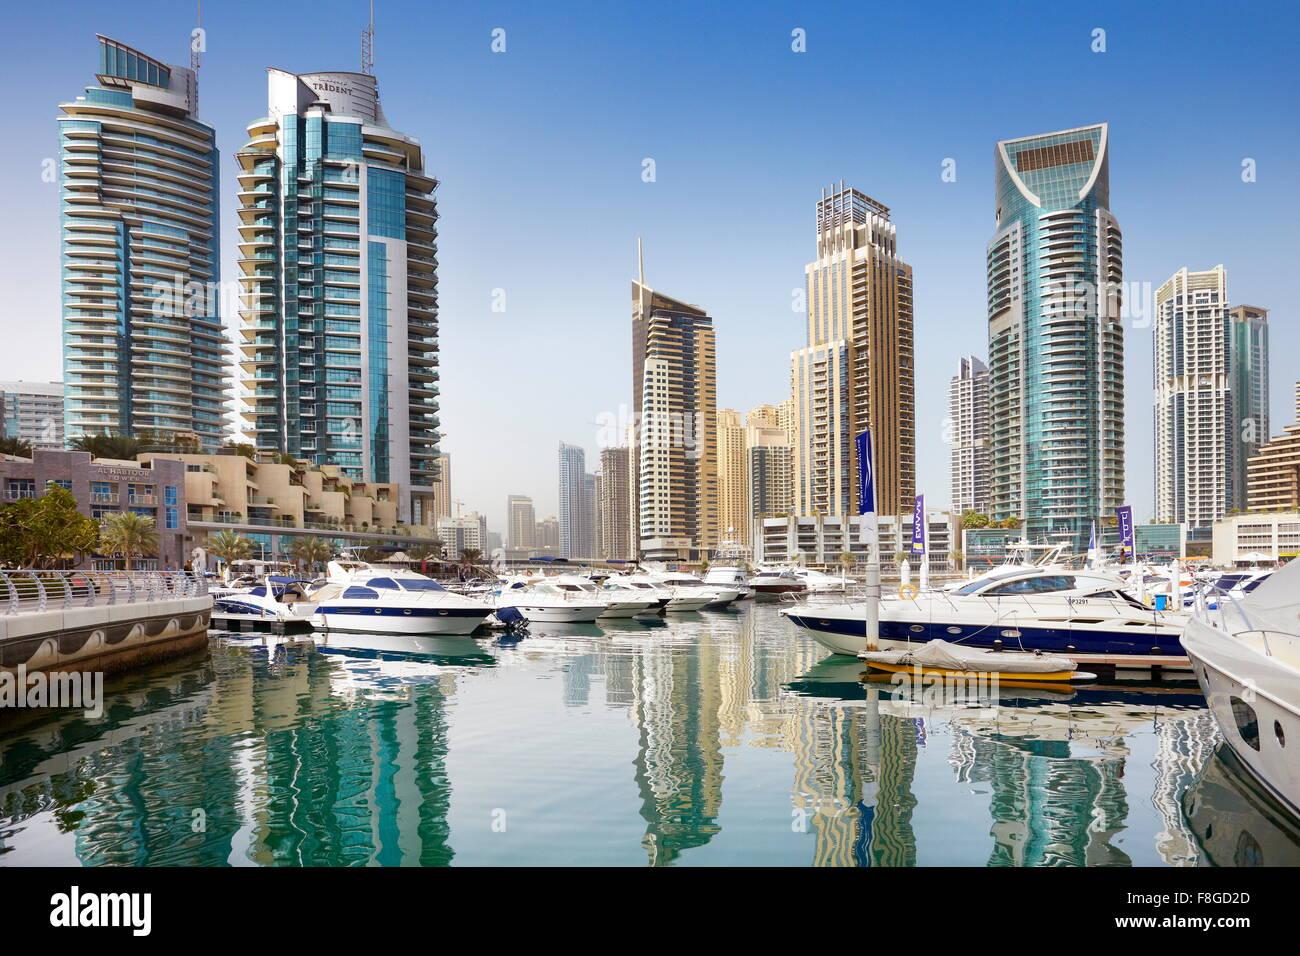 - Marina de la ciudad de Dubai, Emiratos Árabes Unidos Imagen De Stock